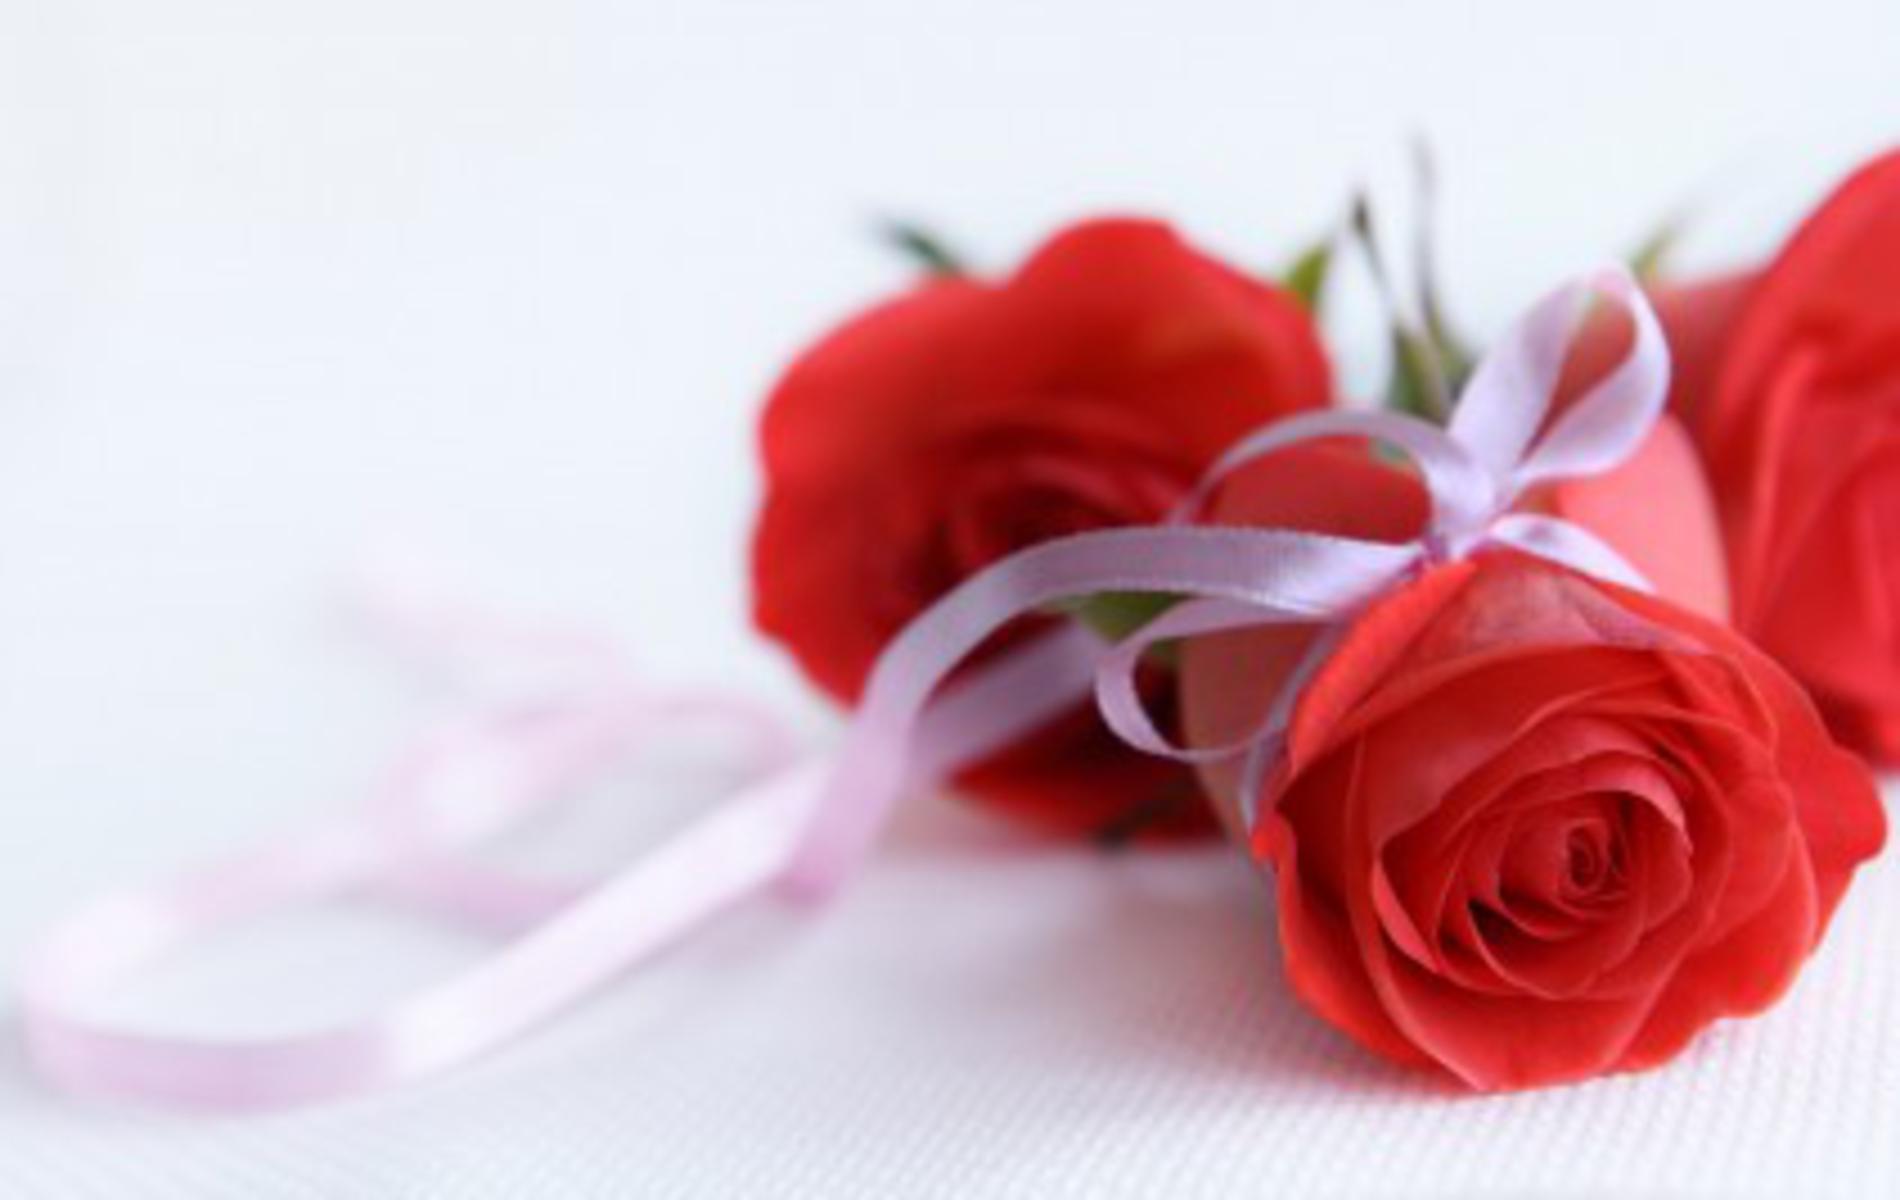 Hd wallpaper rose - Hd Wallpaper Rose Flower Rose Flower Hd Background Wallpaper 66 Hd Wallpaperscom